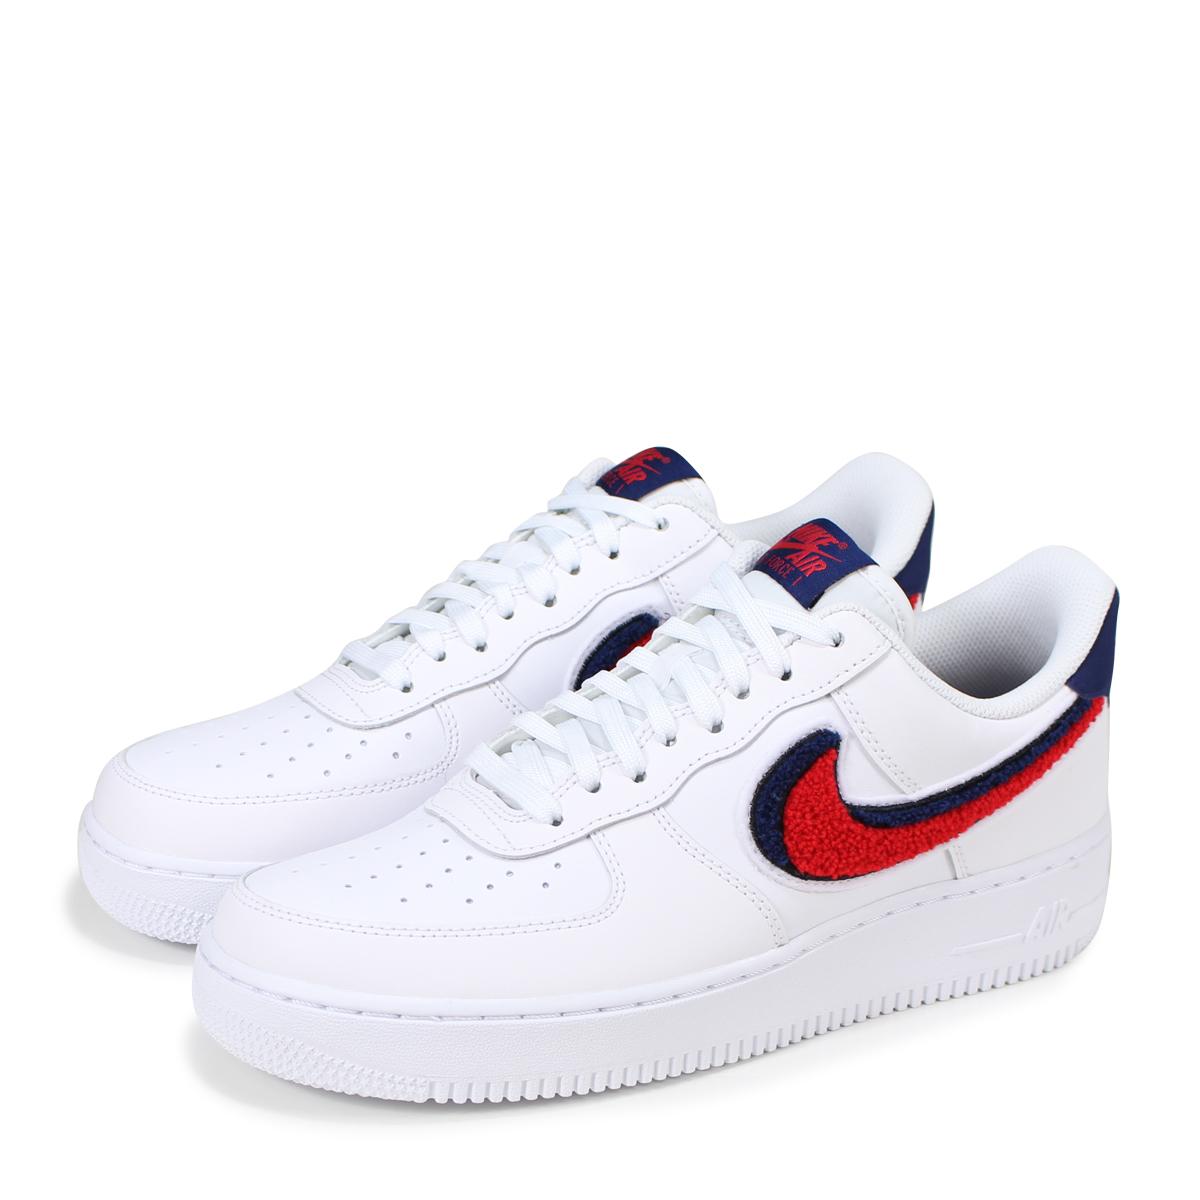 5f85861bb139bb ALLSPORTS  NIKE AIR FORCE 1 07 LV8 Nike air force 1 sneakers men ...